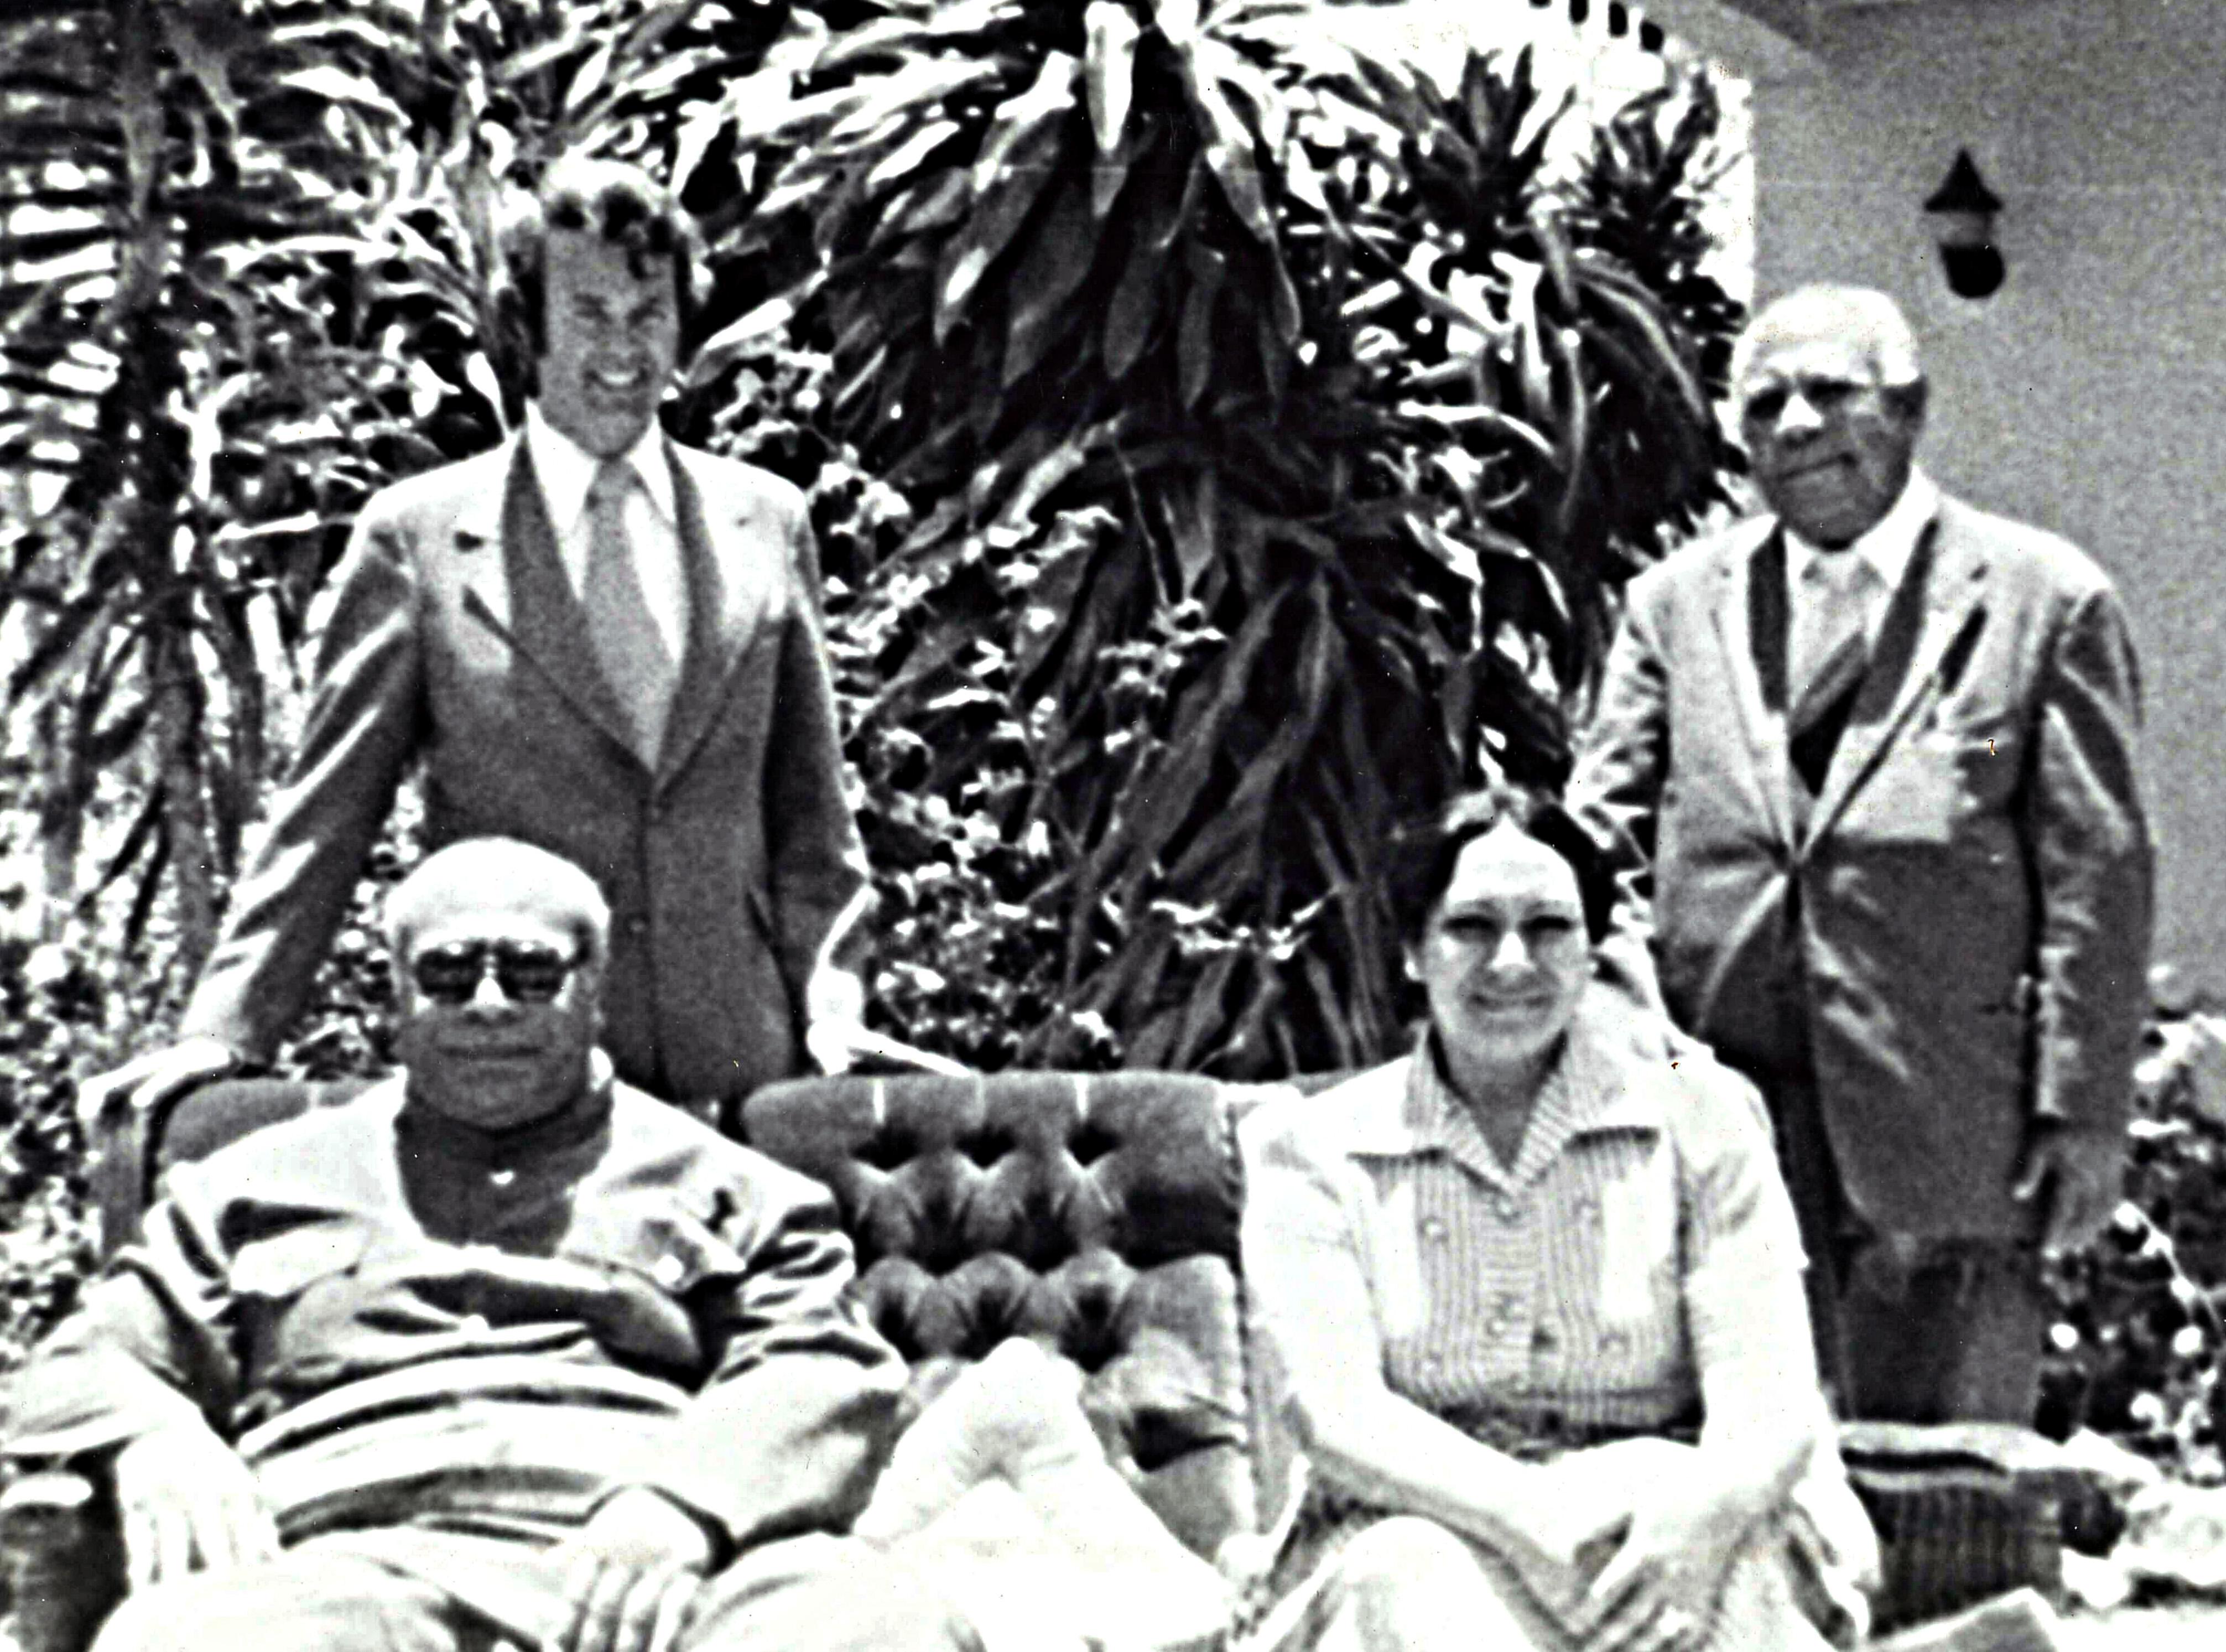 The Rev. H. Eddie Fox (left, rear) poses with King Tāufaʻāhau Tupou IV and Queen Halaevalu Mataʻaho ʻAhomeʻe of Tonga (seated) in 1975. Photo courtesy of the Rev. H. Eddie Fox